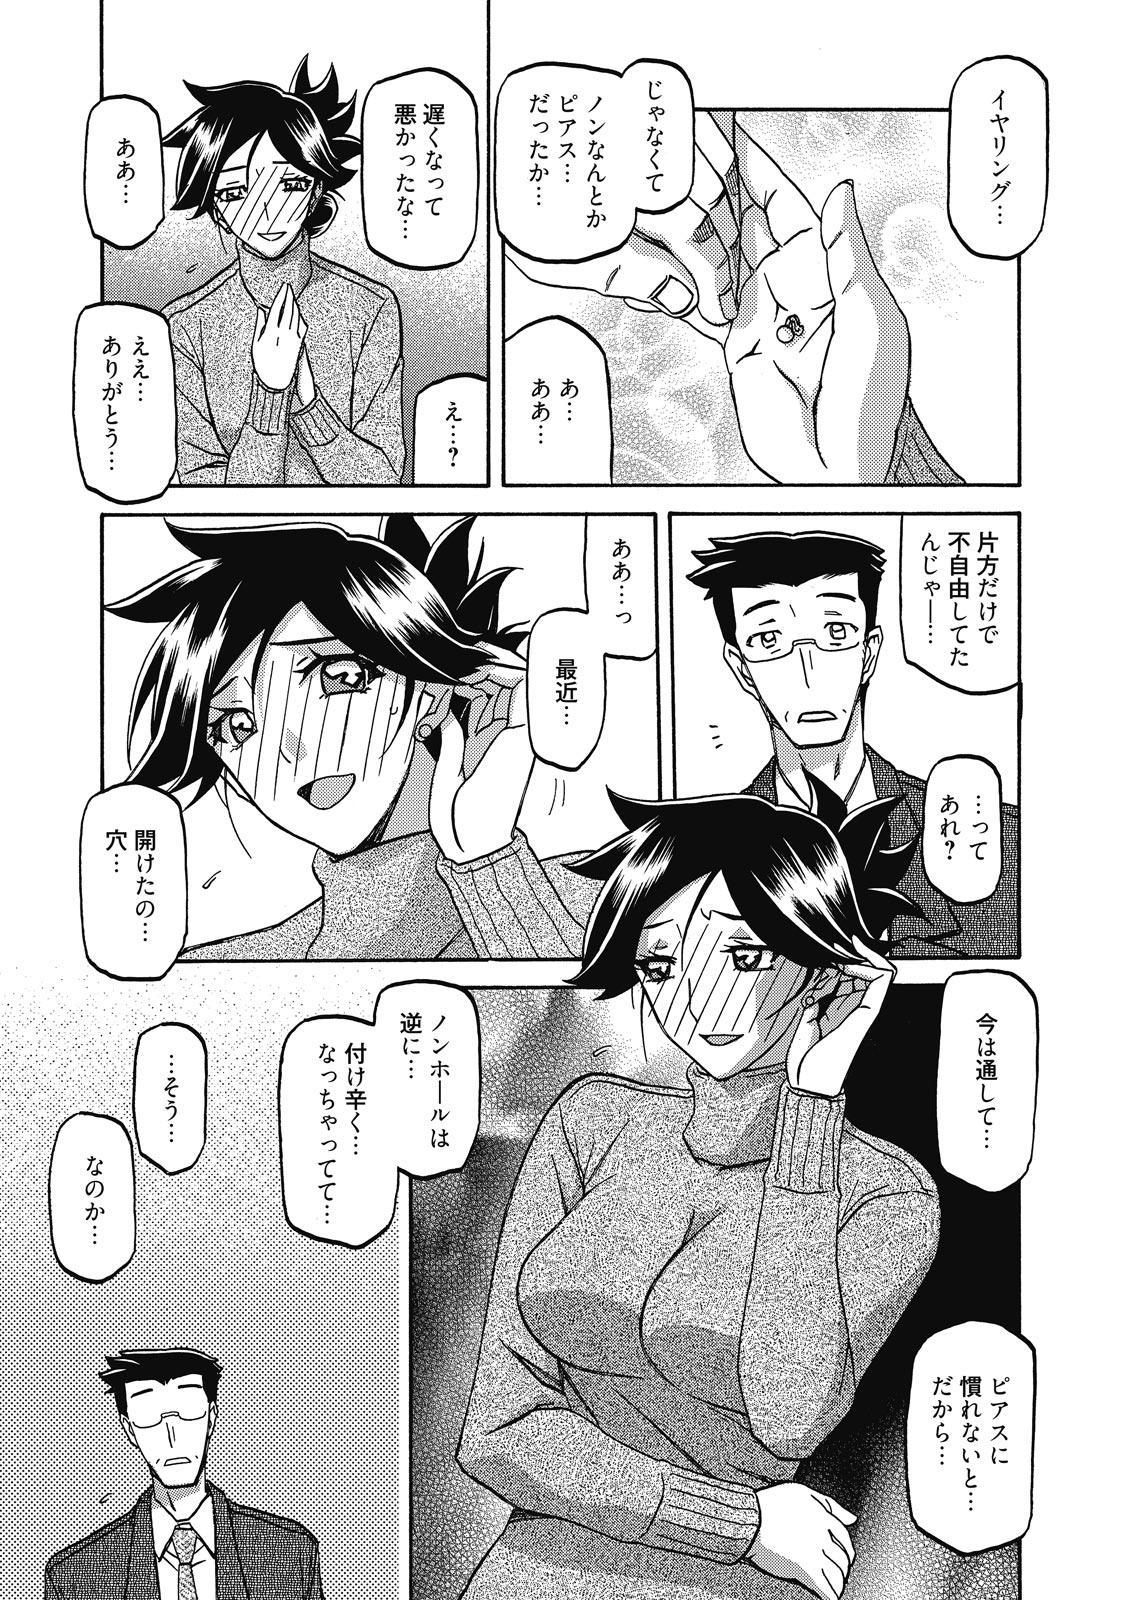 Web Manga Bangaichi Vol. 7 50